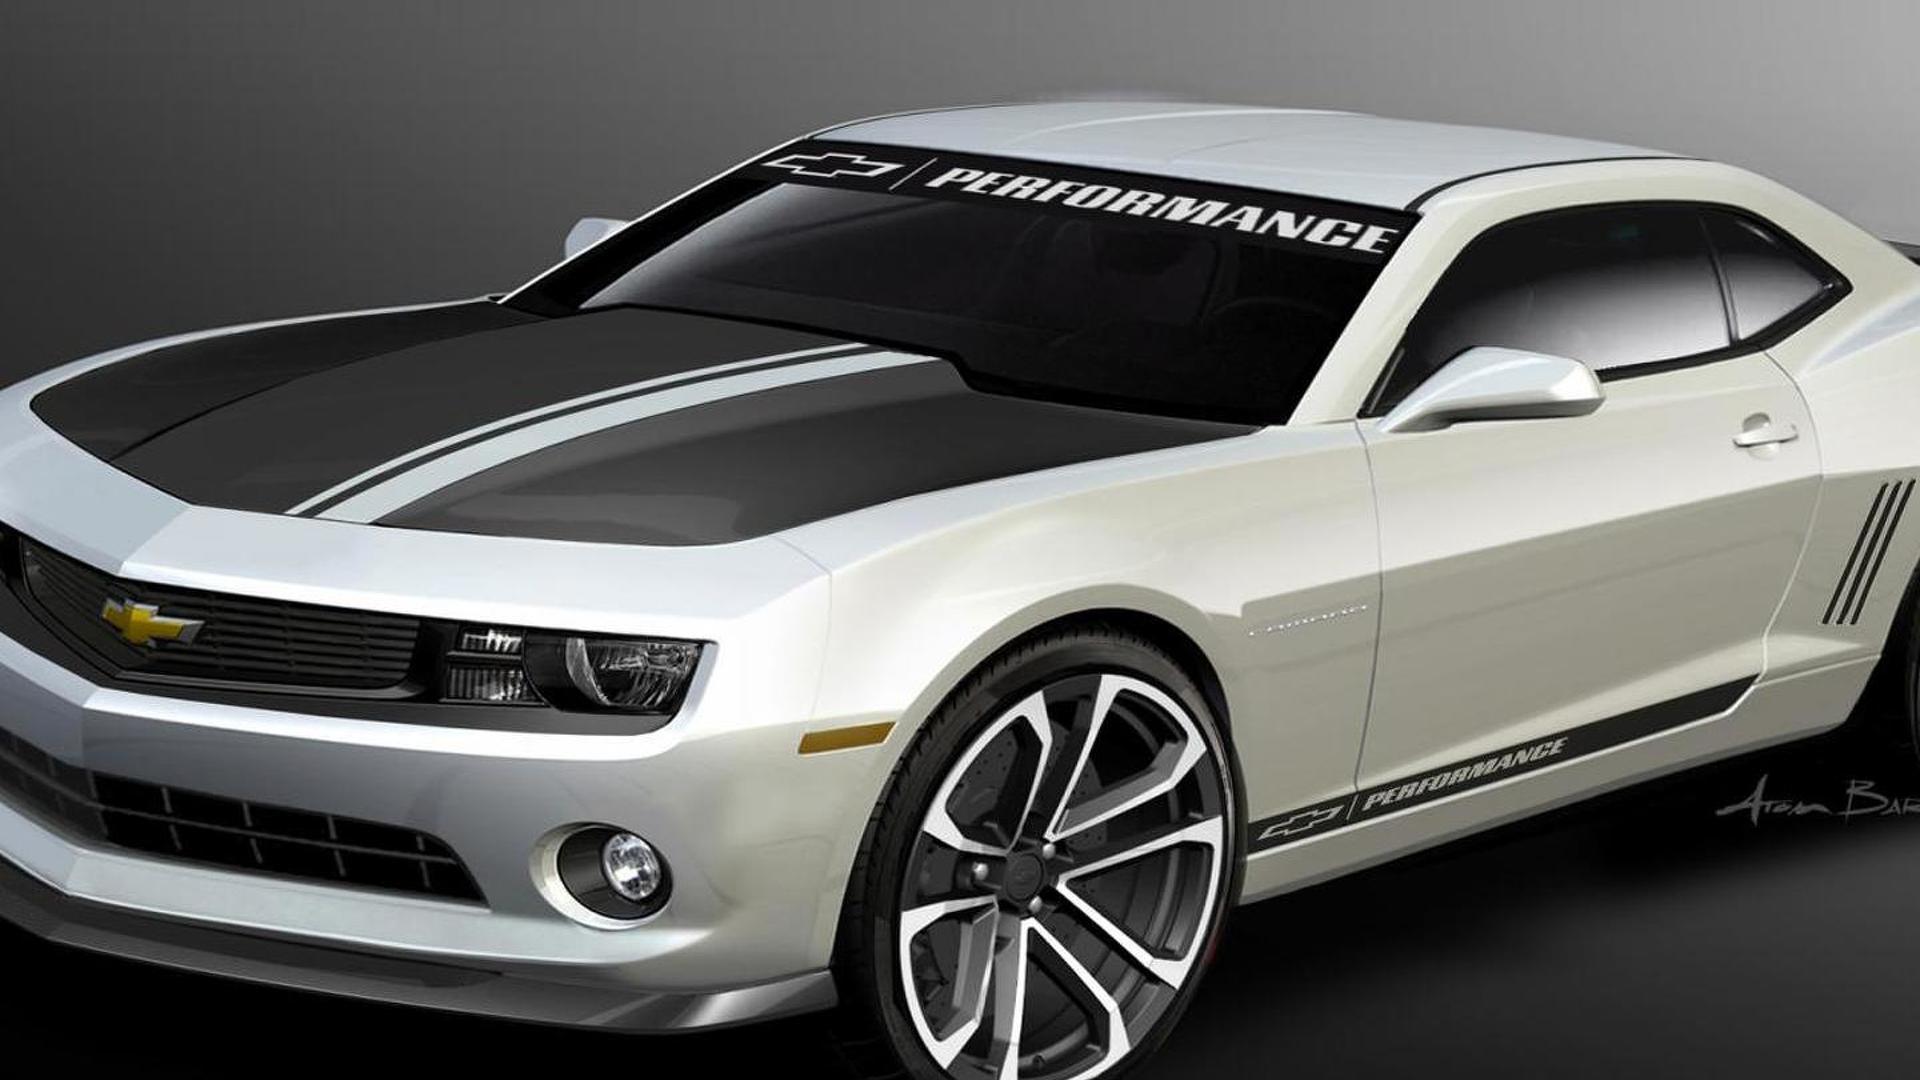 2014 Chevrolet Camaro facelift announced for New York Auto Show